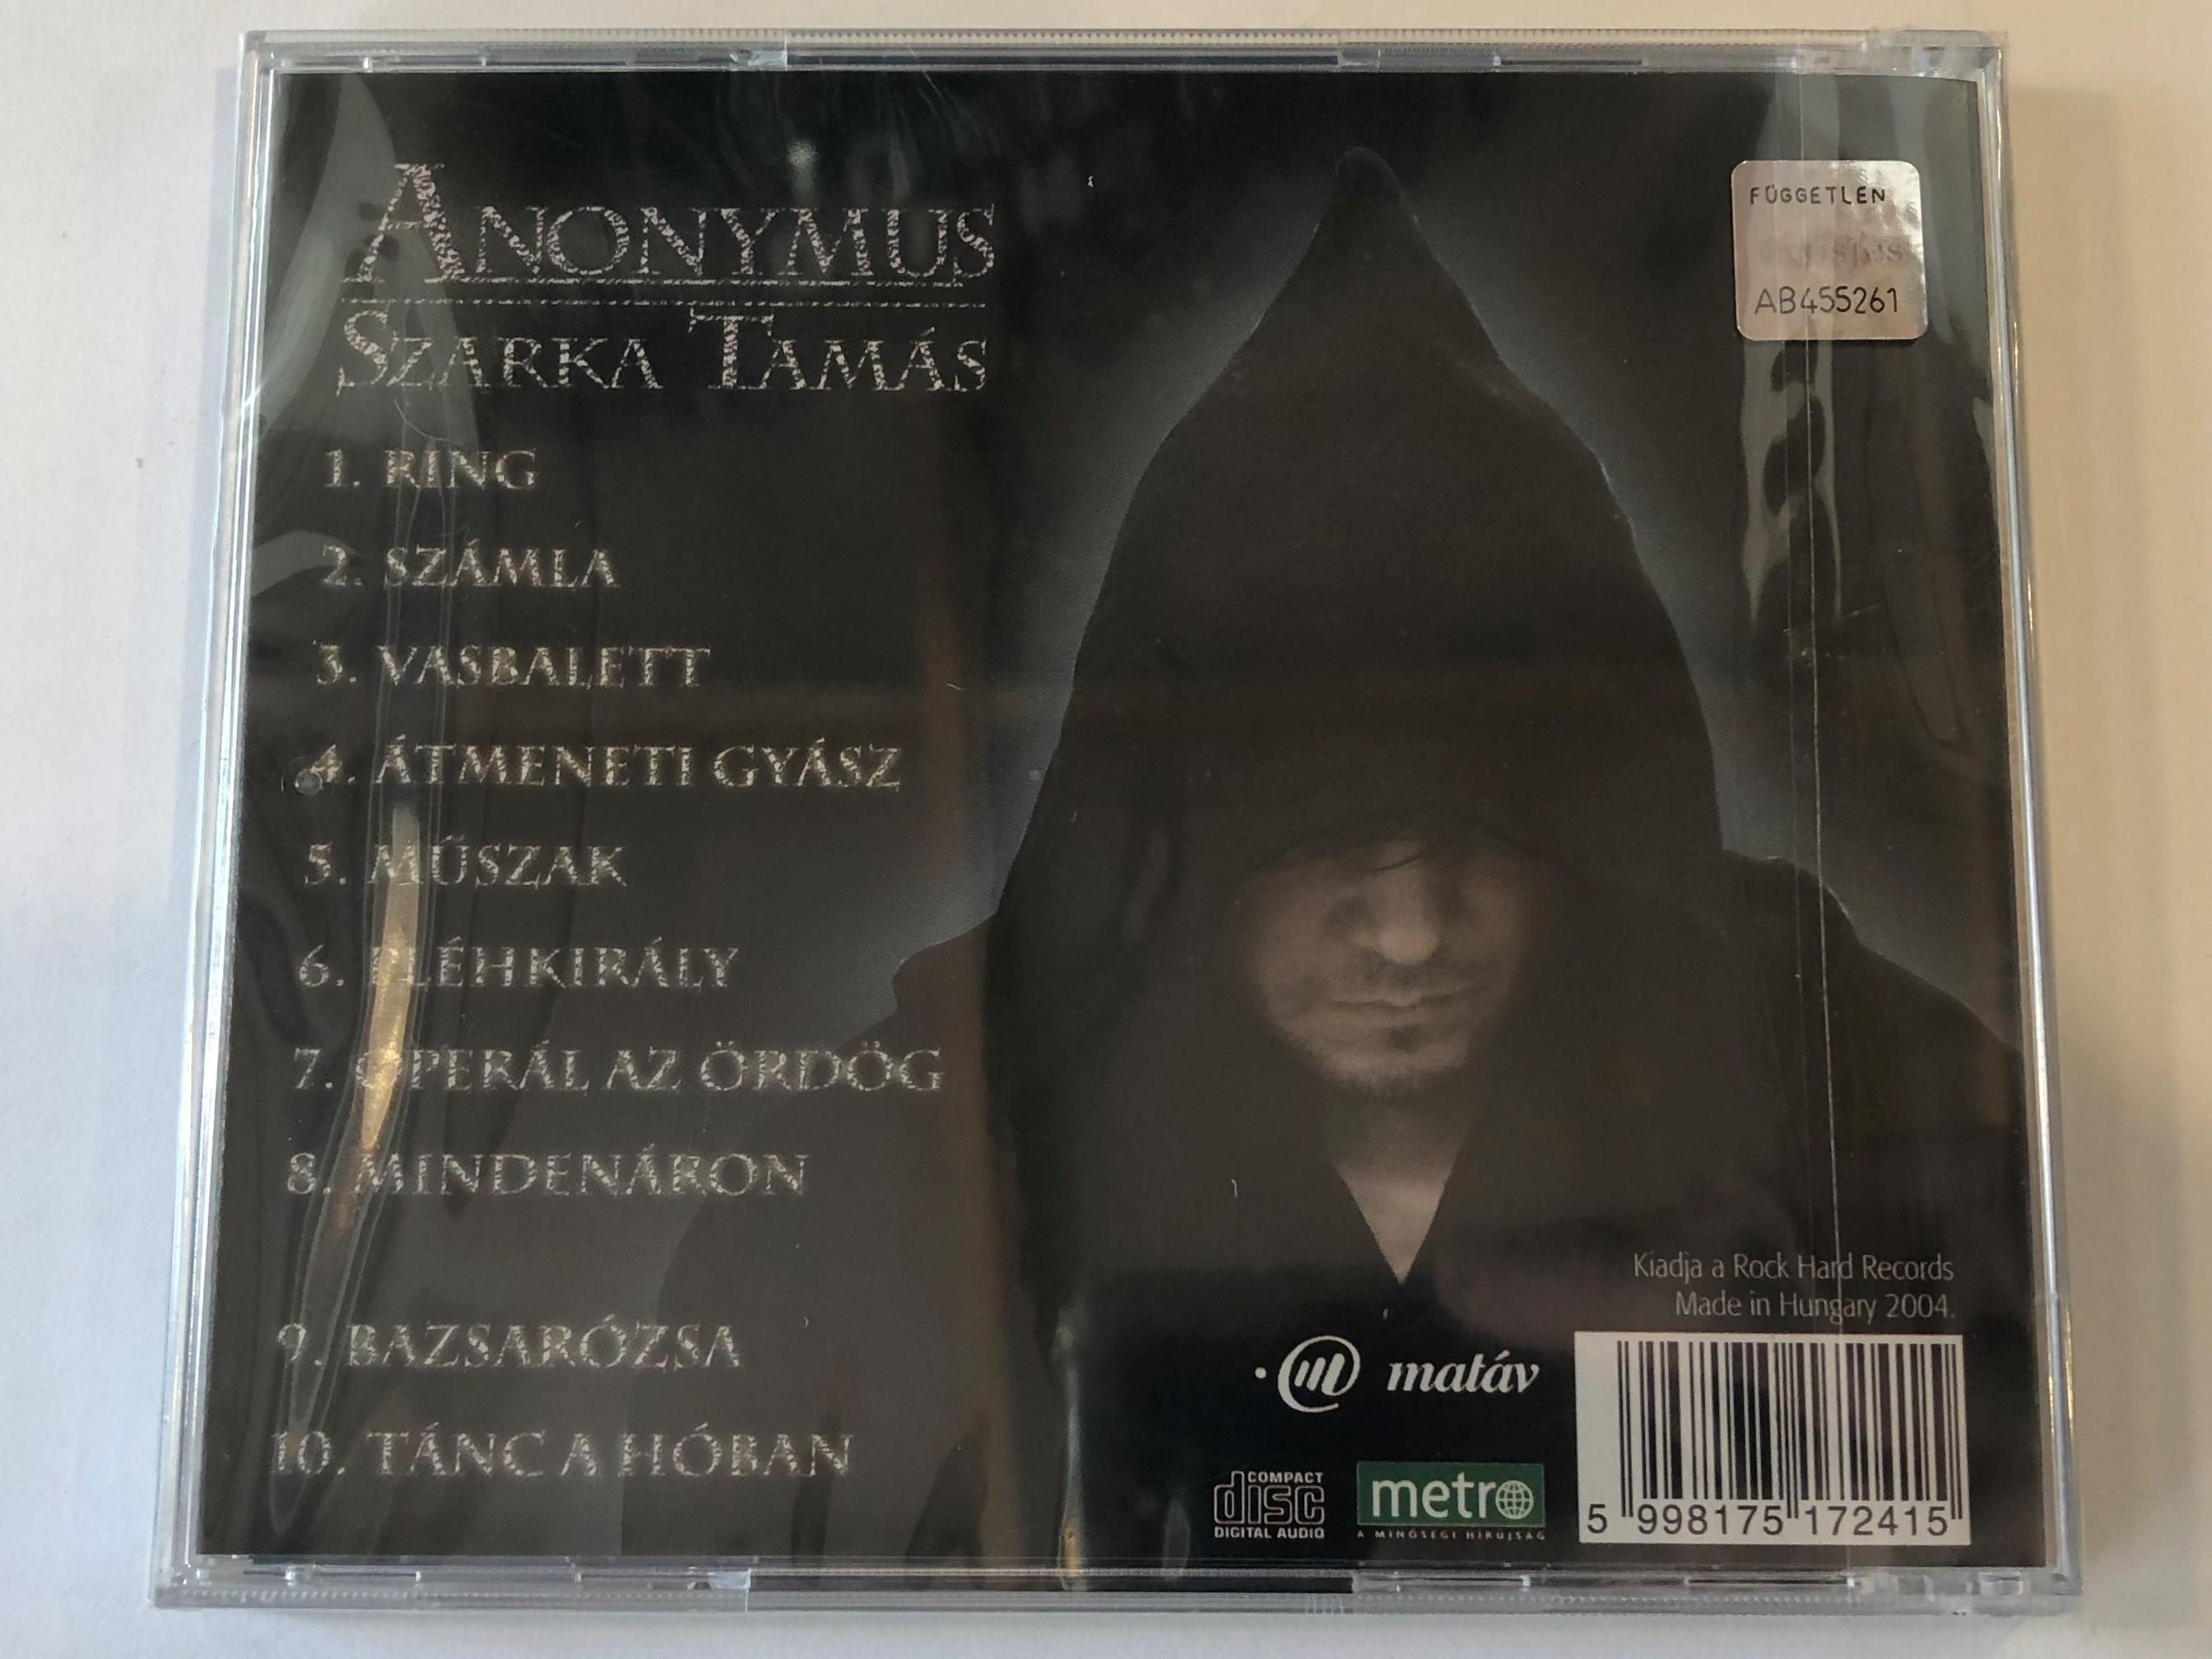 anonymus-szarka-tam-s-rock-hard-records-audio-cd-2004-5998175172415-2-.jpg